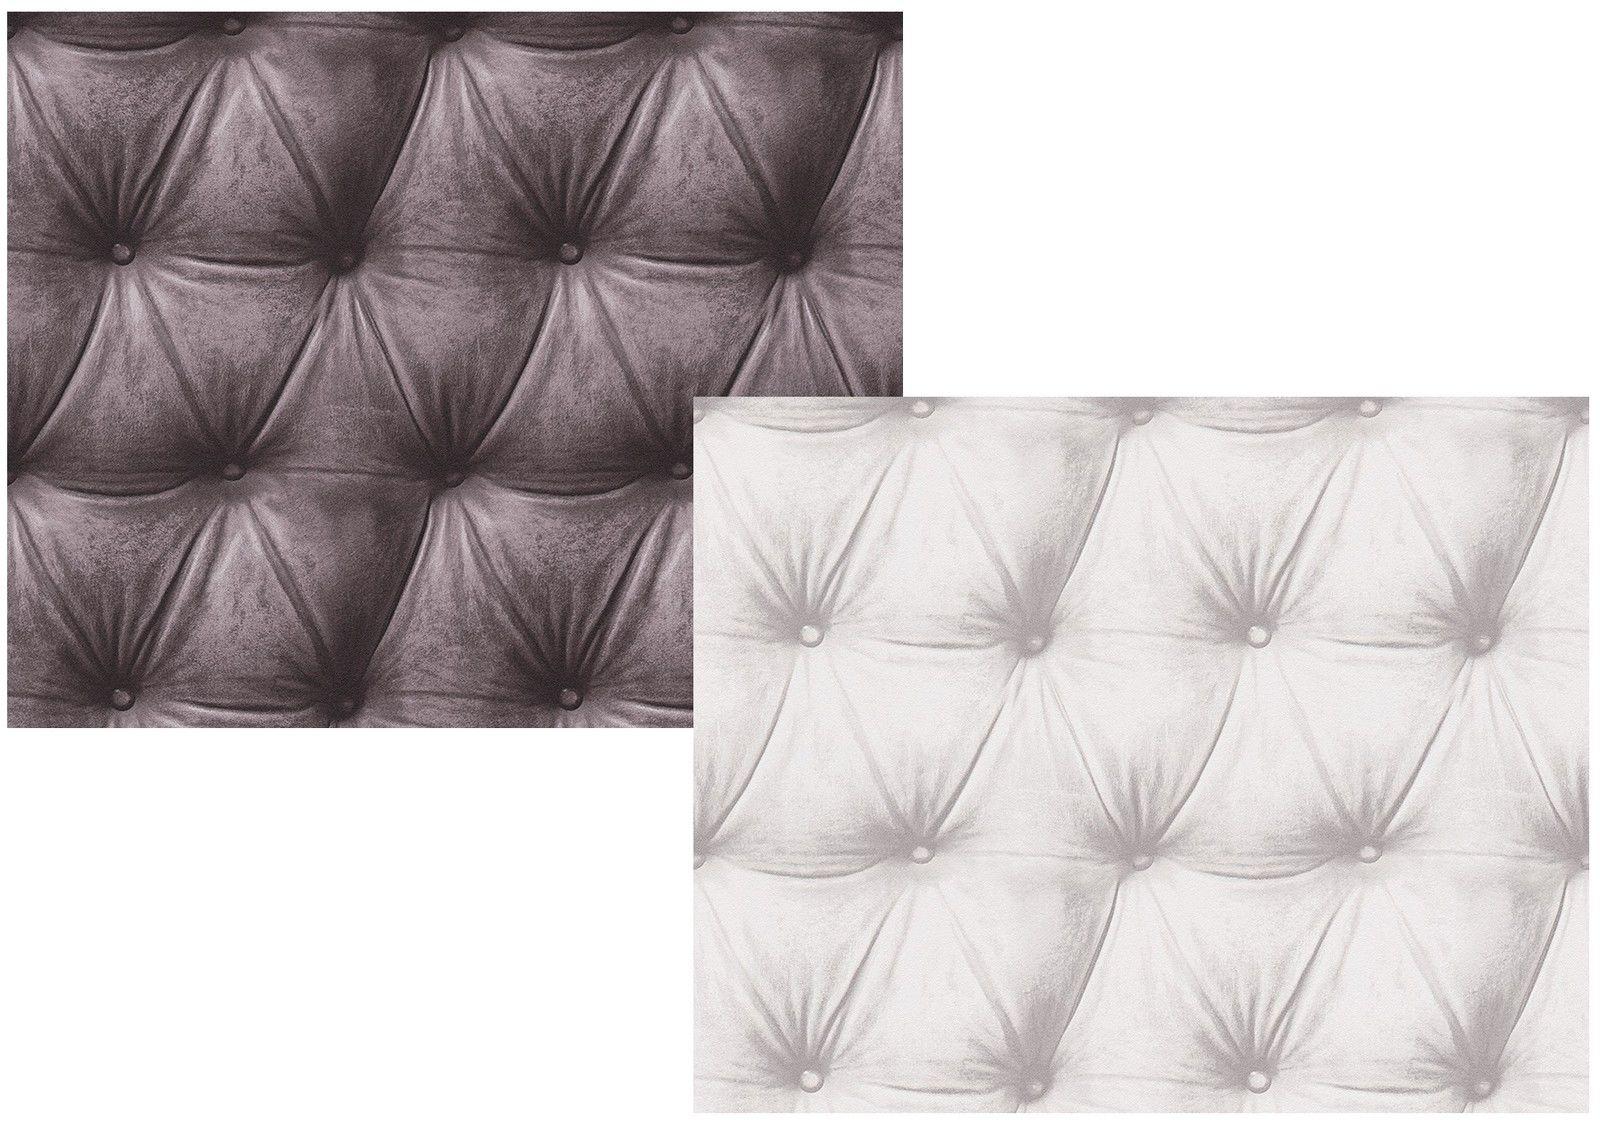 Tapeten design braun wohndesign for Design tapete grau